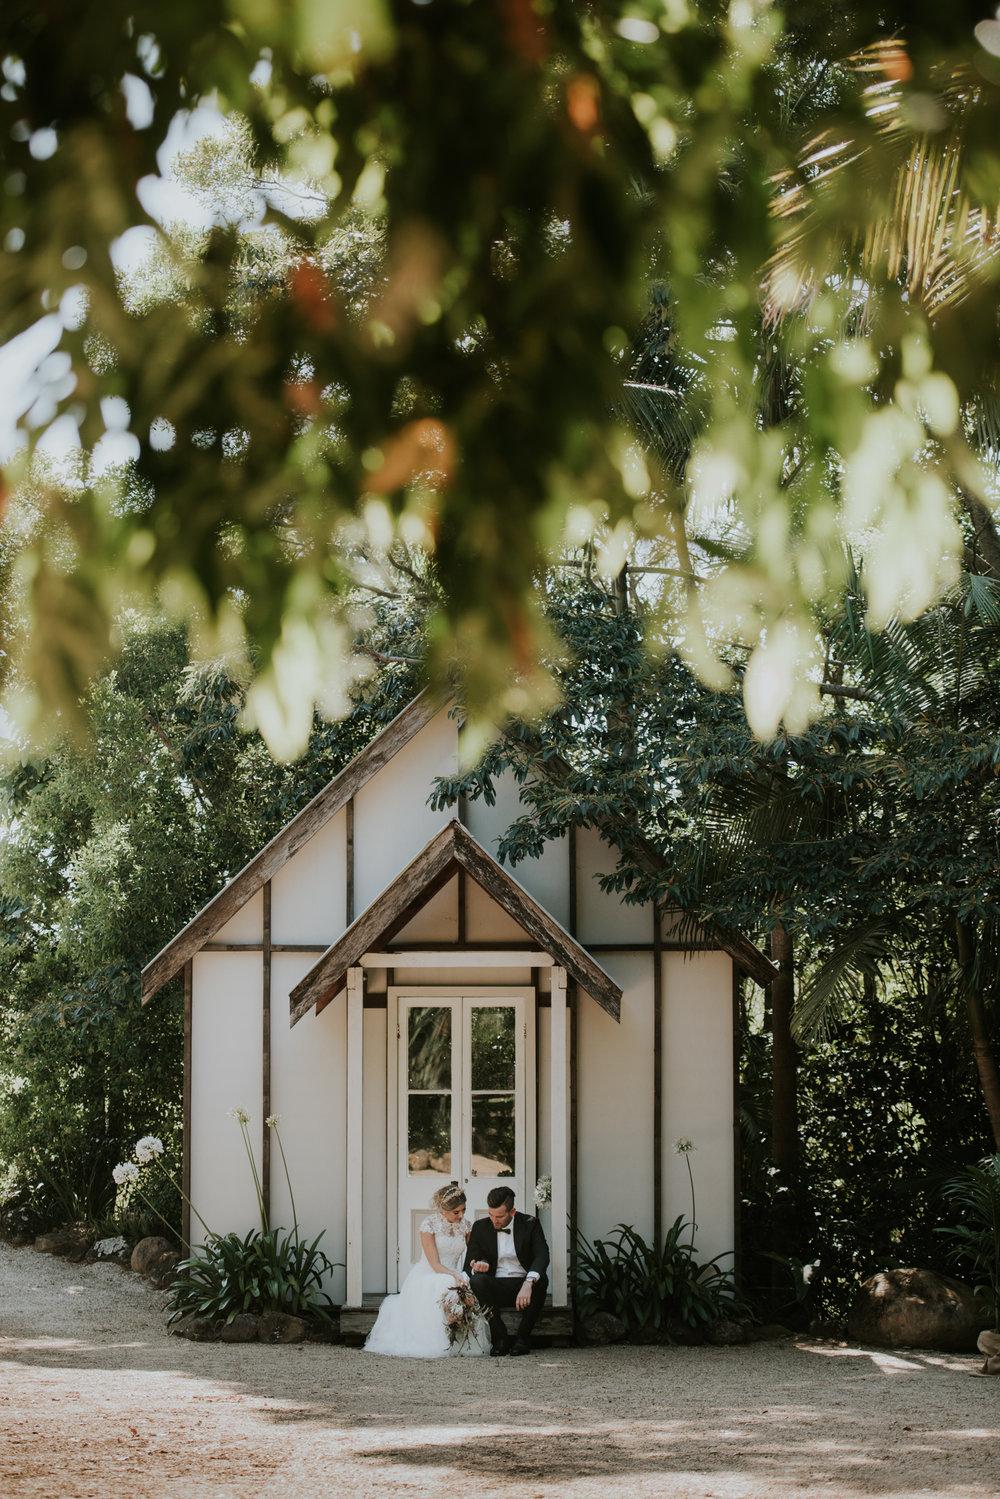 Byron Bay Wedding Photographer | Engagement-Elopement Photography-46.jpg